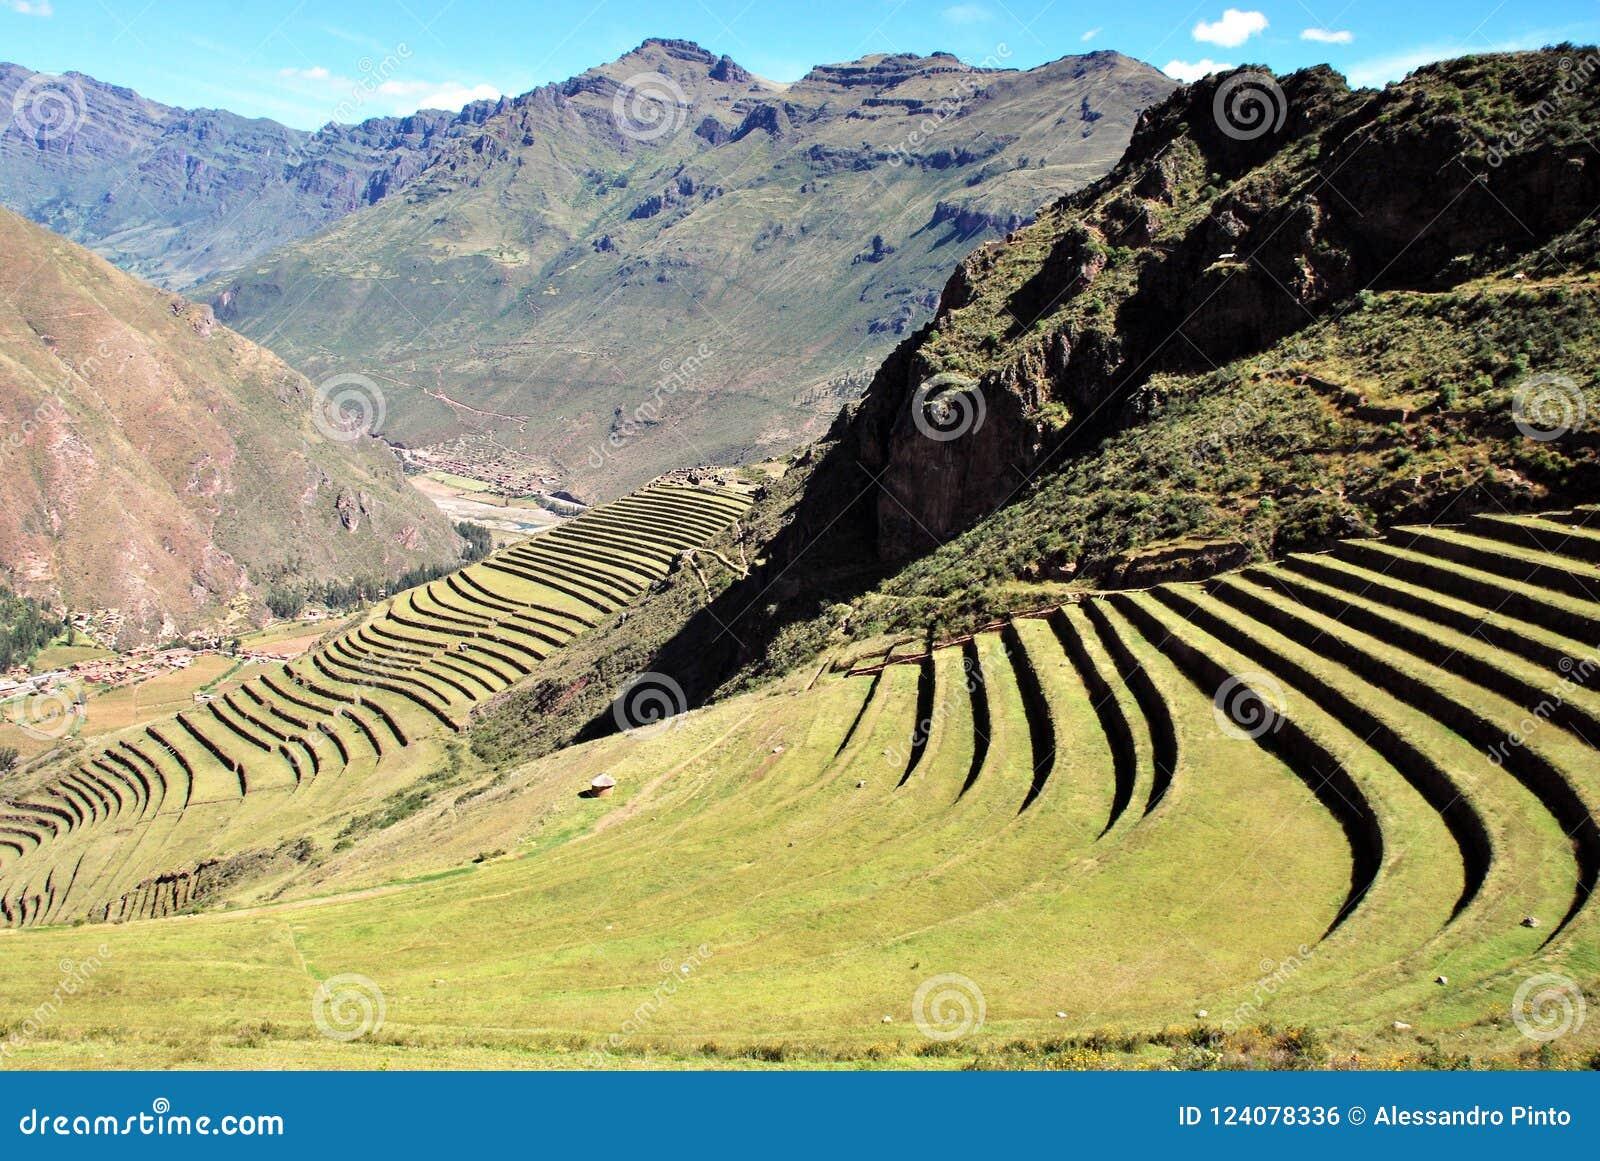 Landscape in Pisac in the Urubamba valley